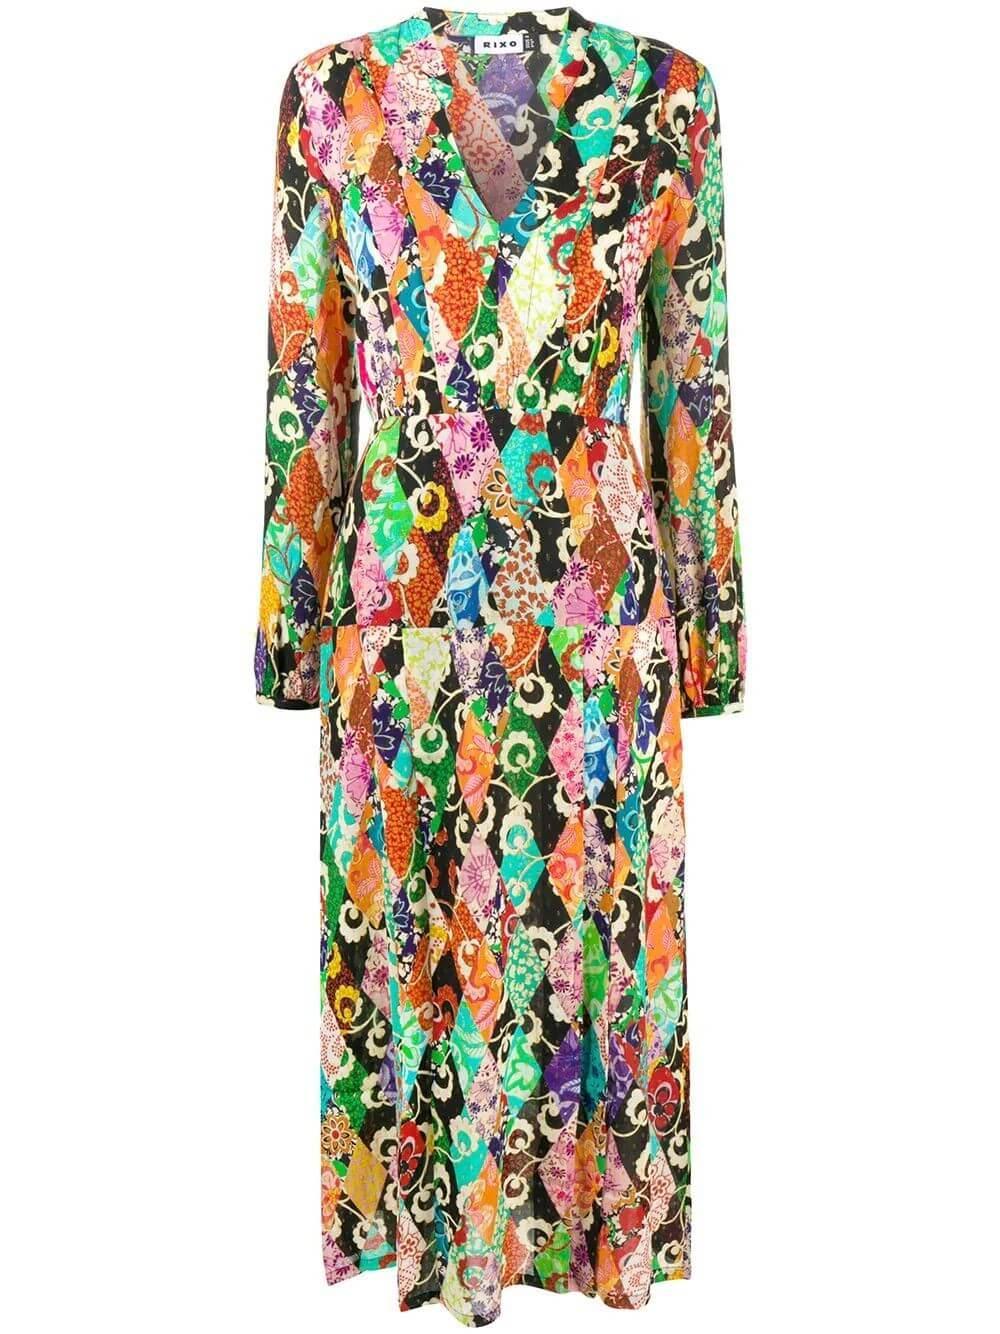 Long Sleeve Carwash Skirt Midi Dress Item # RIX10-570-320-887